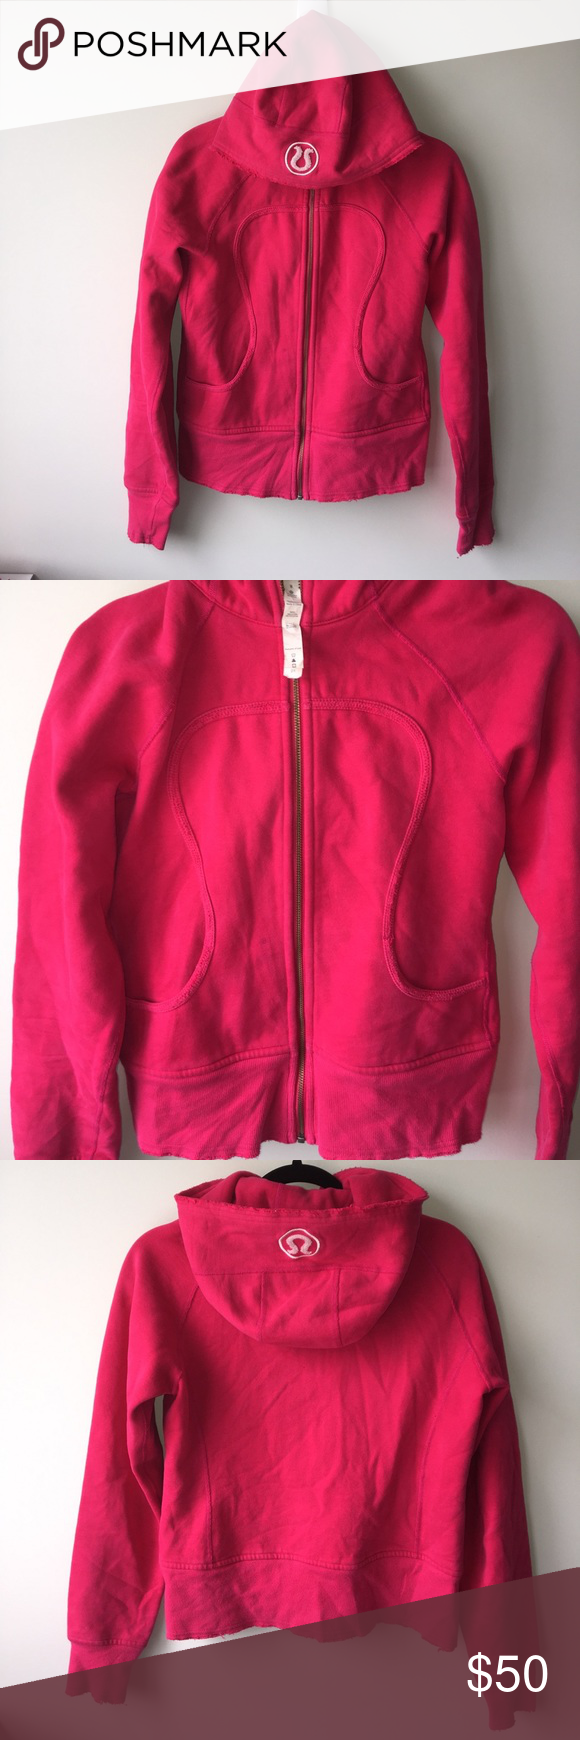 Lululemon pink Scuba hoodie sz 8 Pre loved good condition, has faint stain barely visible, missing Lululemon logo string on zipper.DLJ 13 lululemon athletica Sweaters